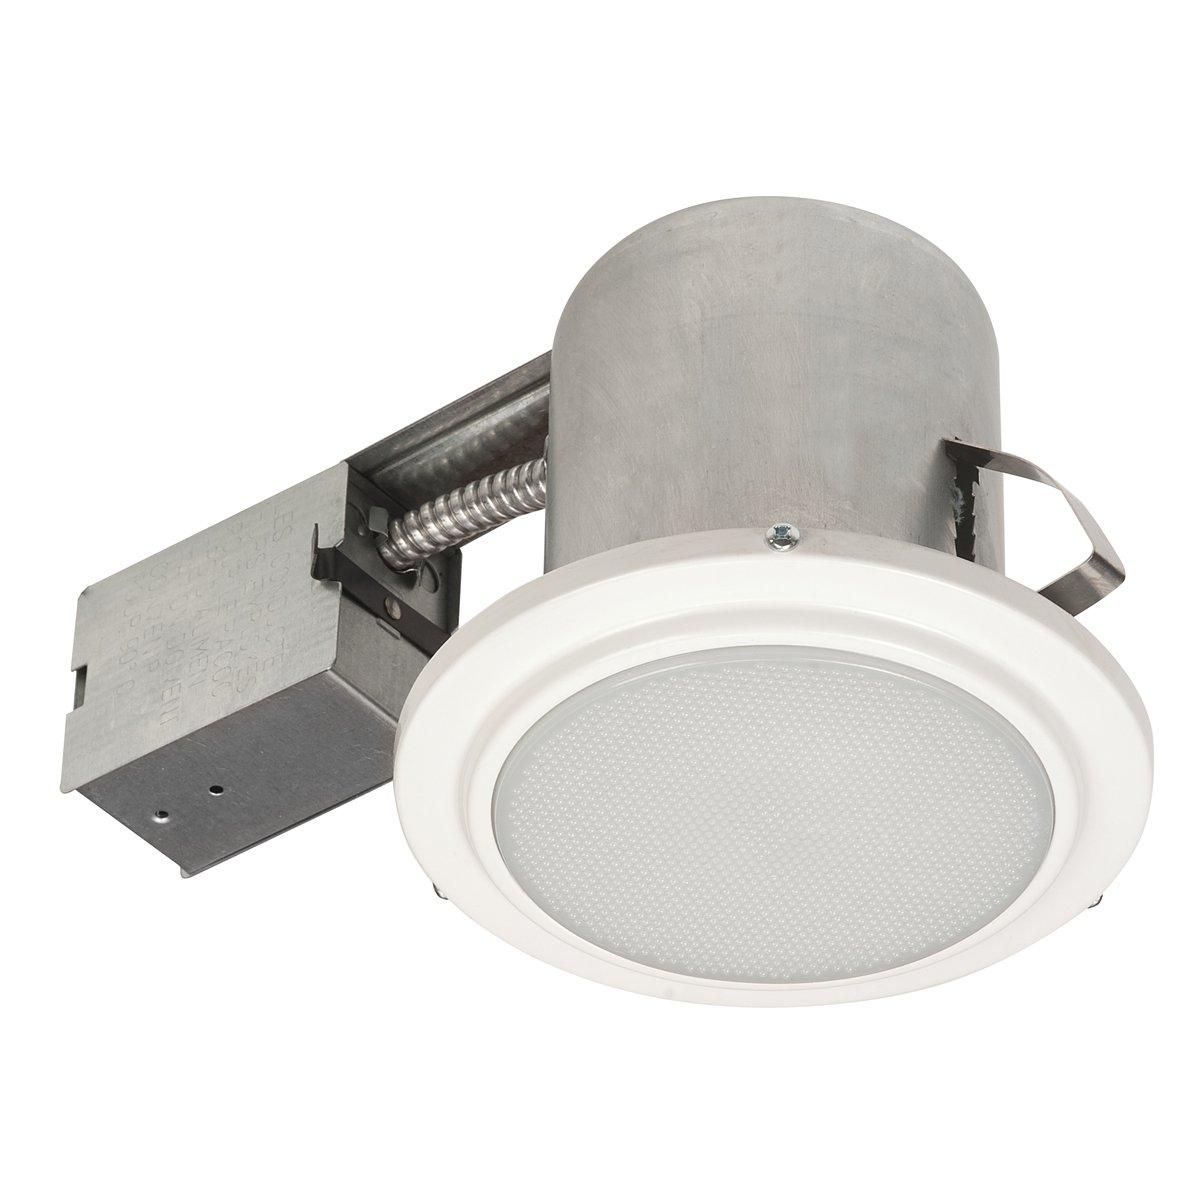 Downlight Push N Click Globe Electric 90036 Image 1